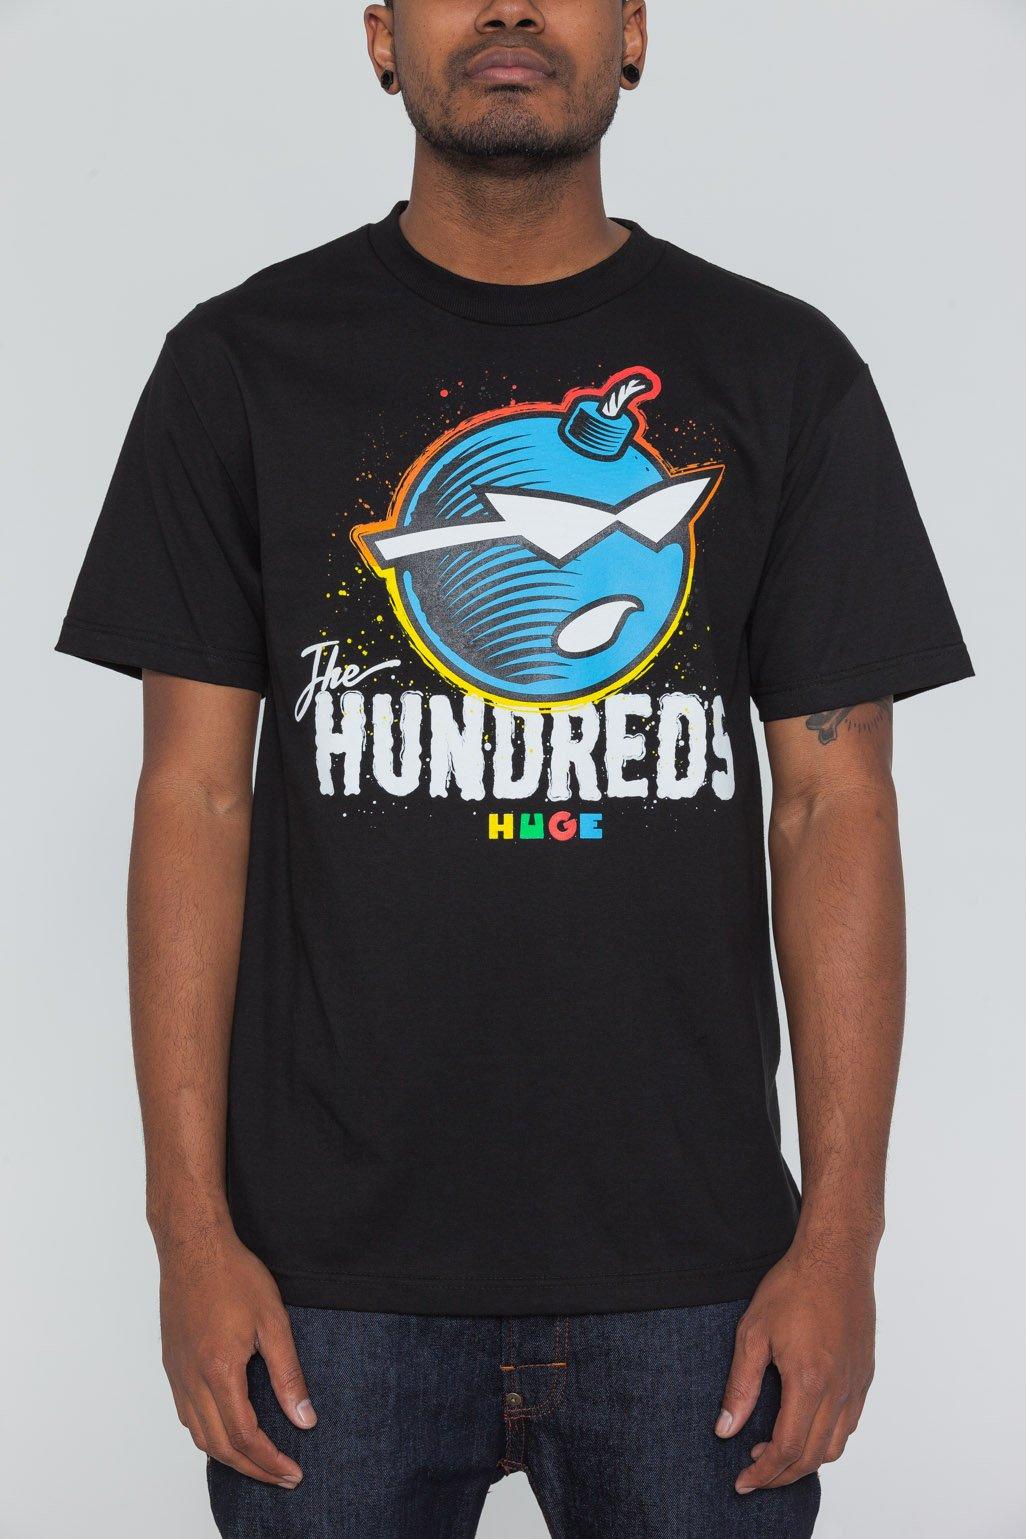 Shadies T-Shirt